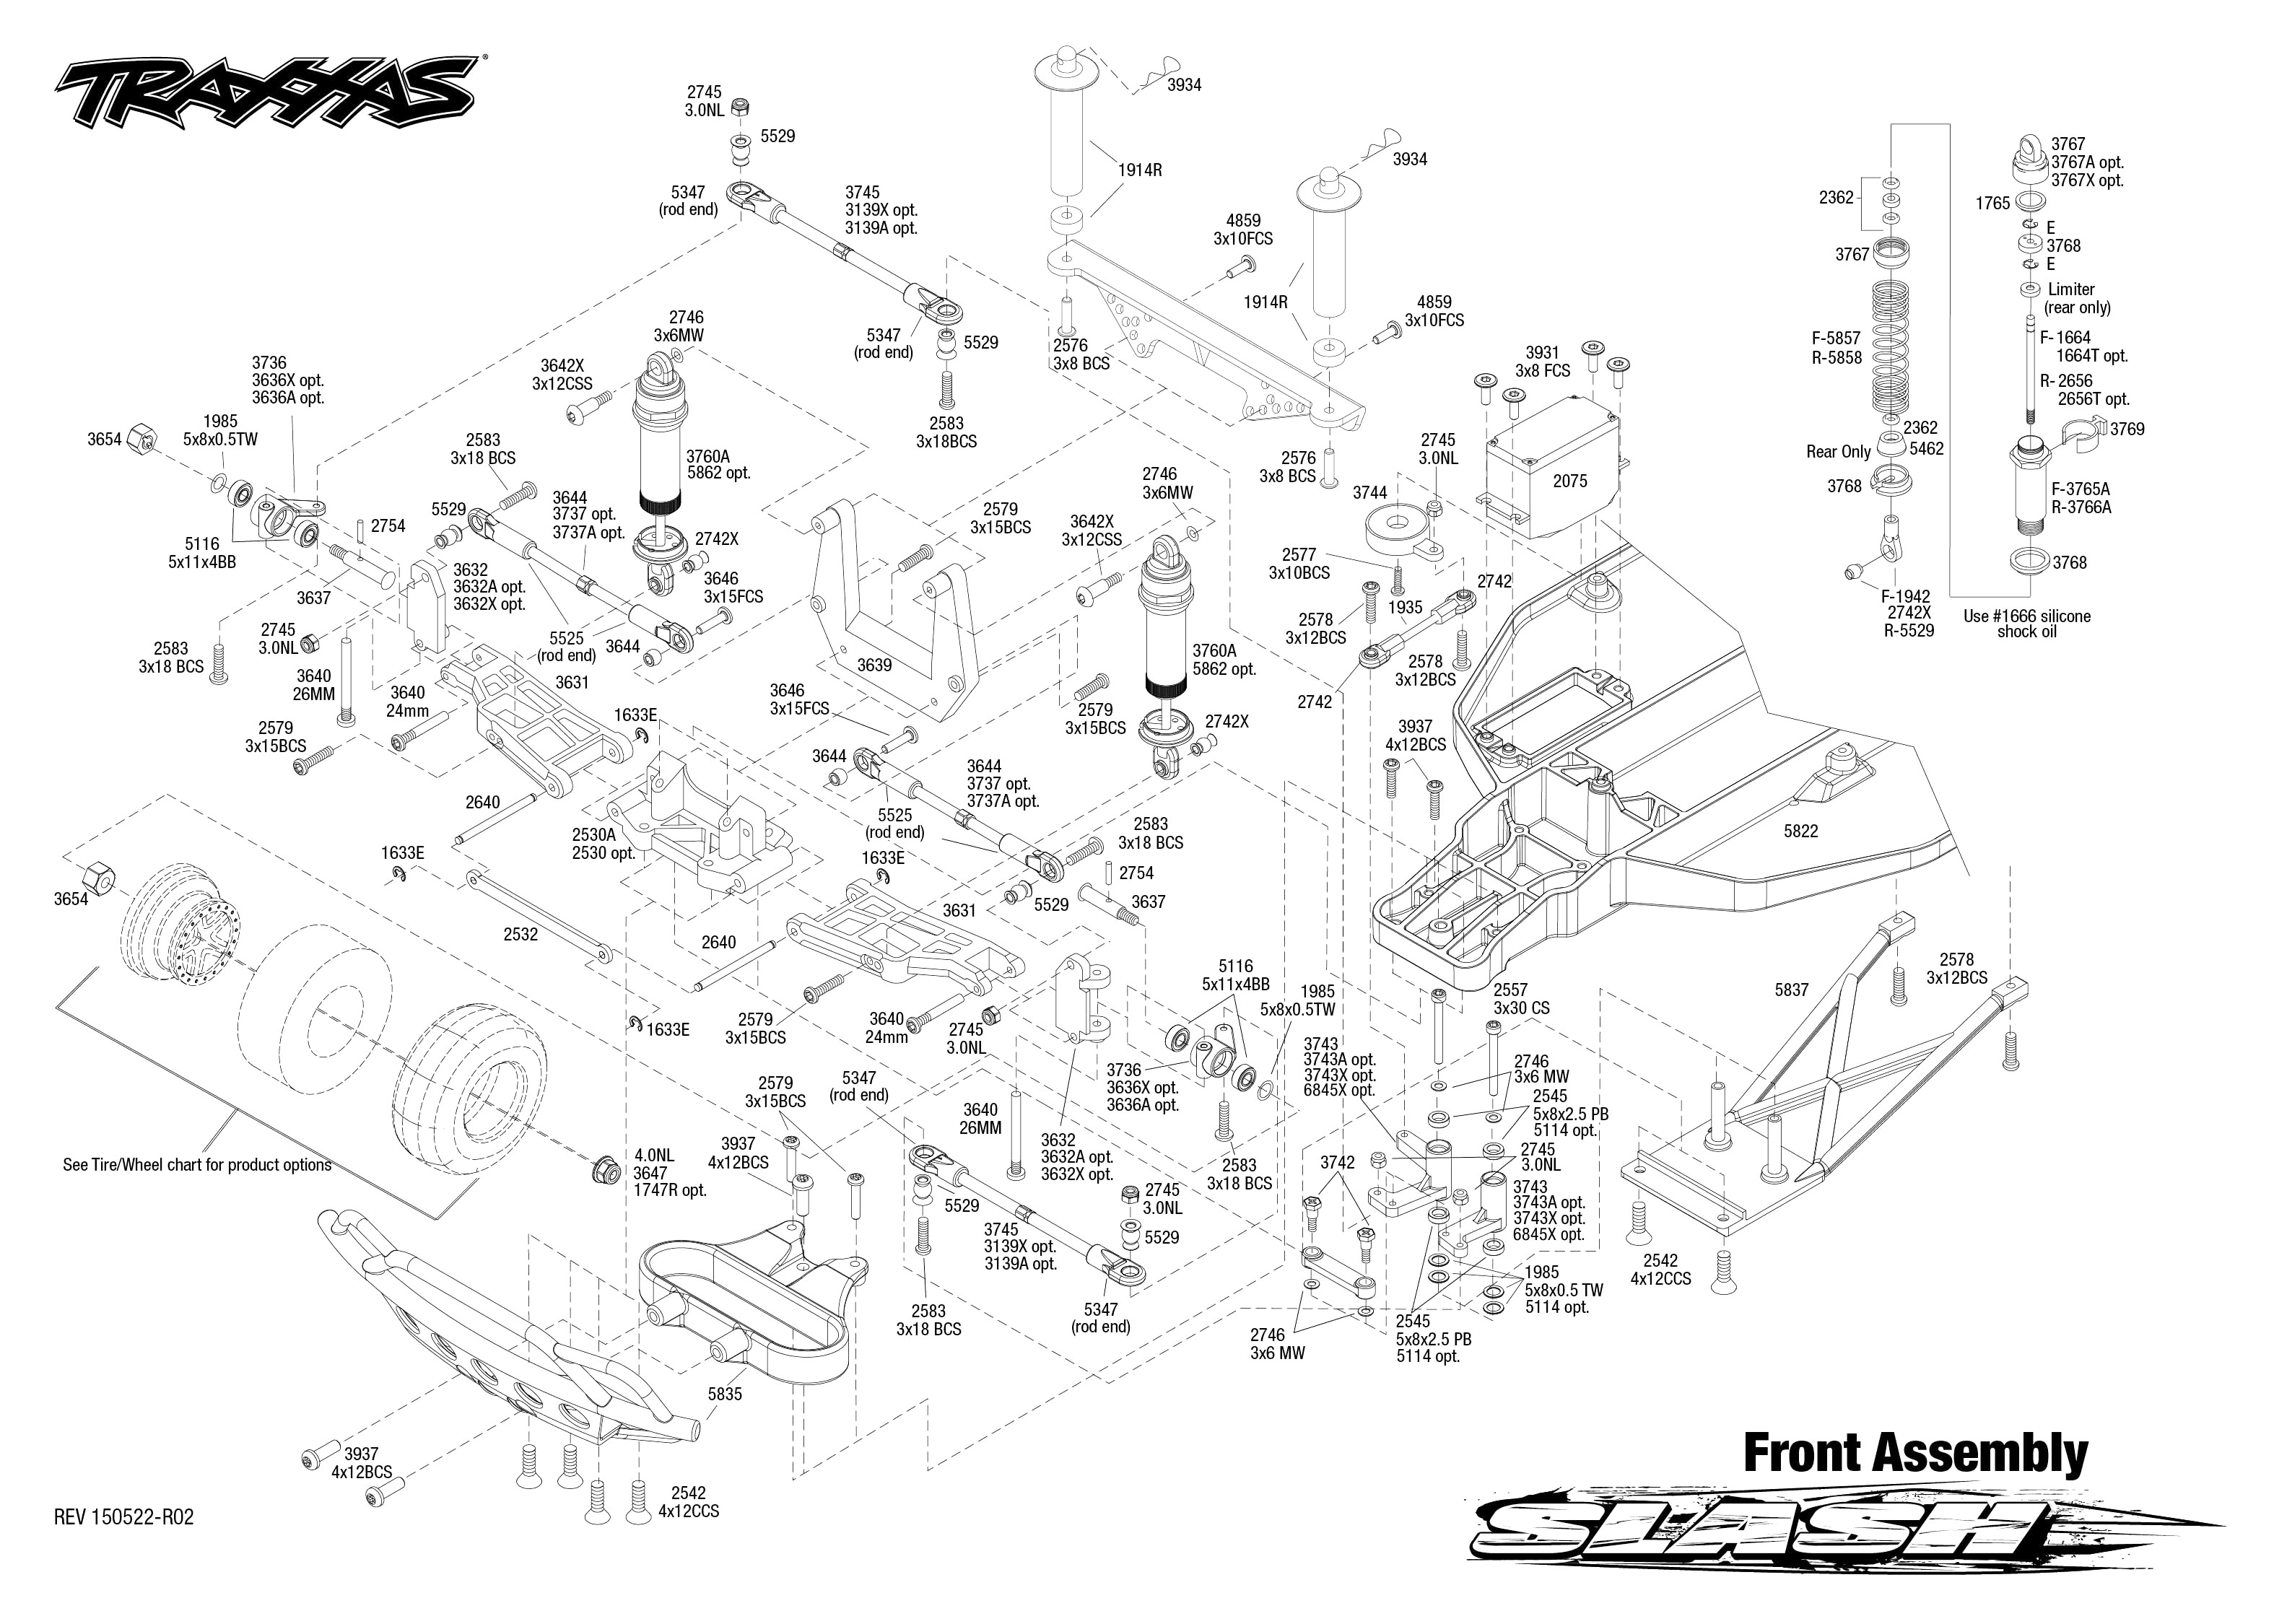 traxxas slash 2wd diagram wiring diagrams traxxas slash 2wd assembly manual traxxas slash 2wd diagram #2